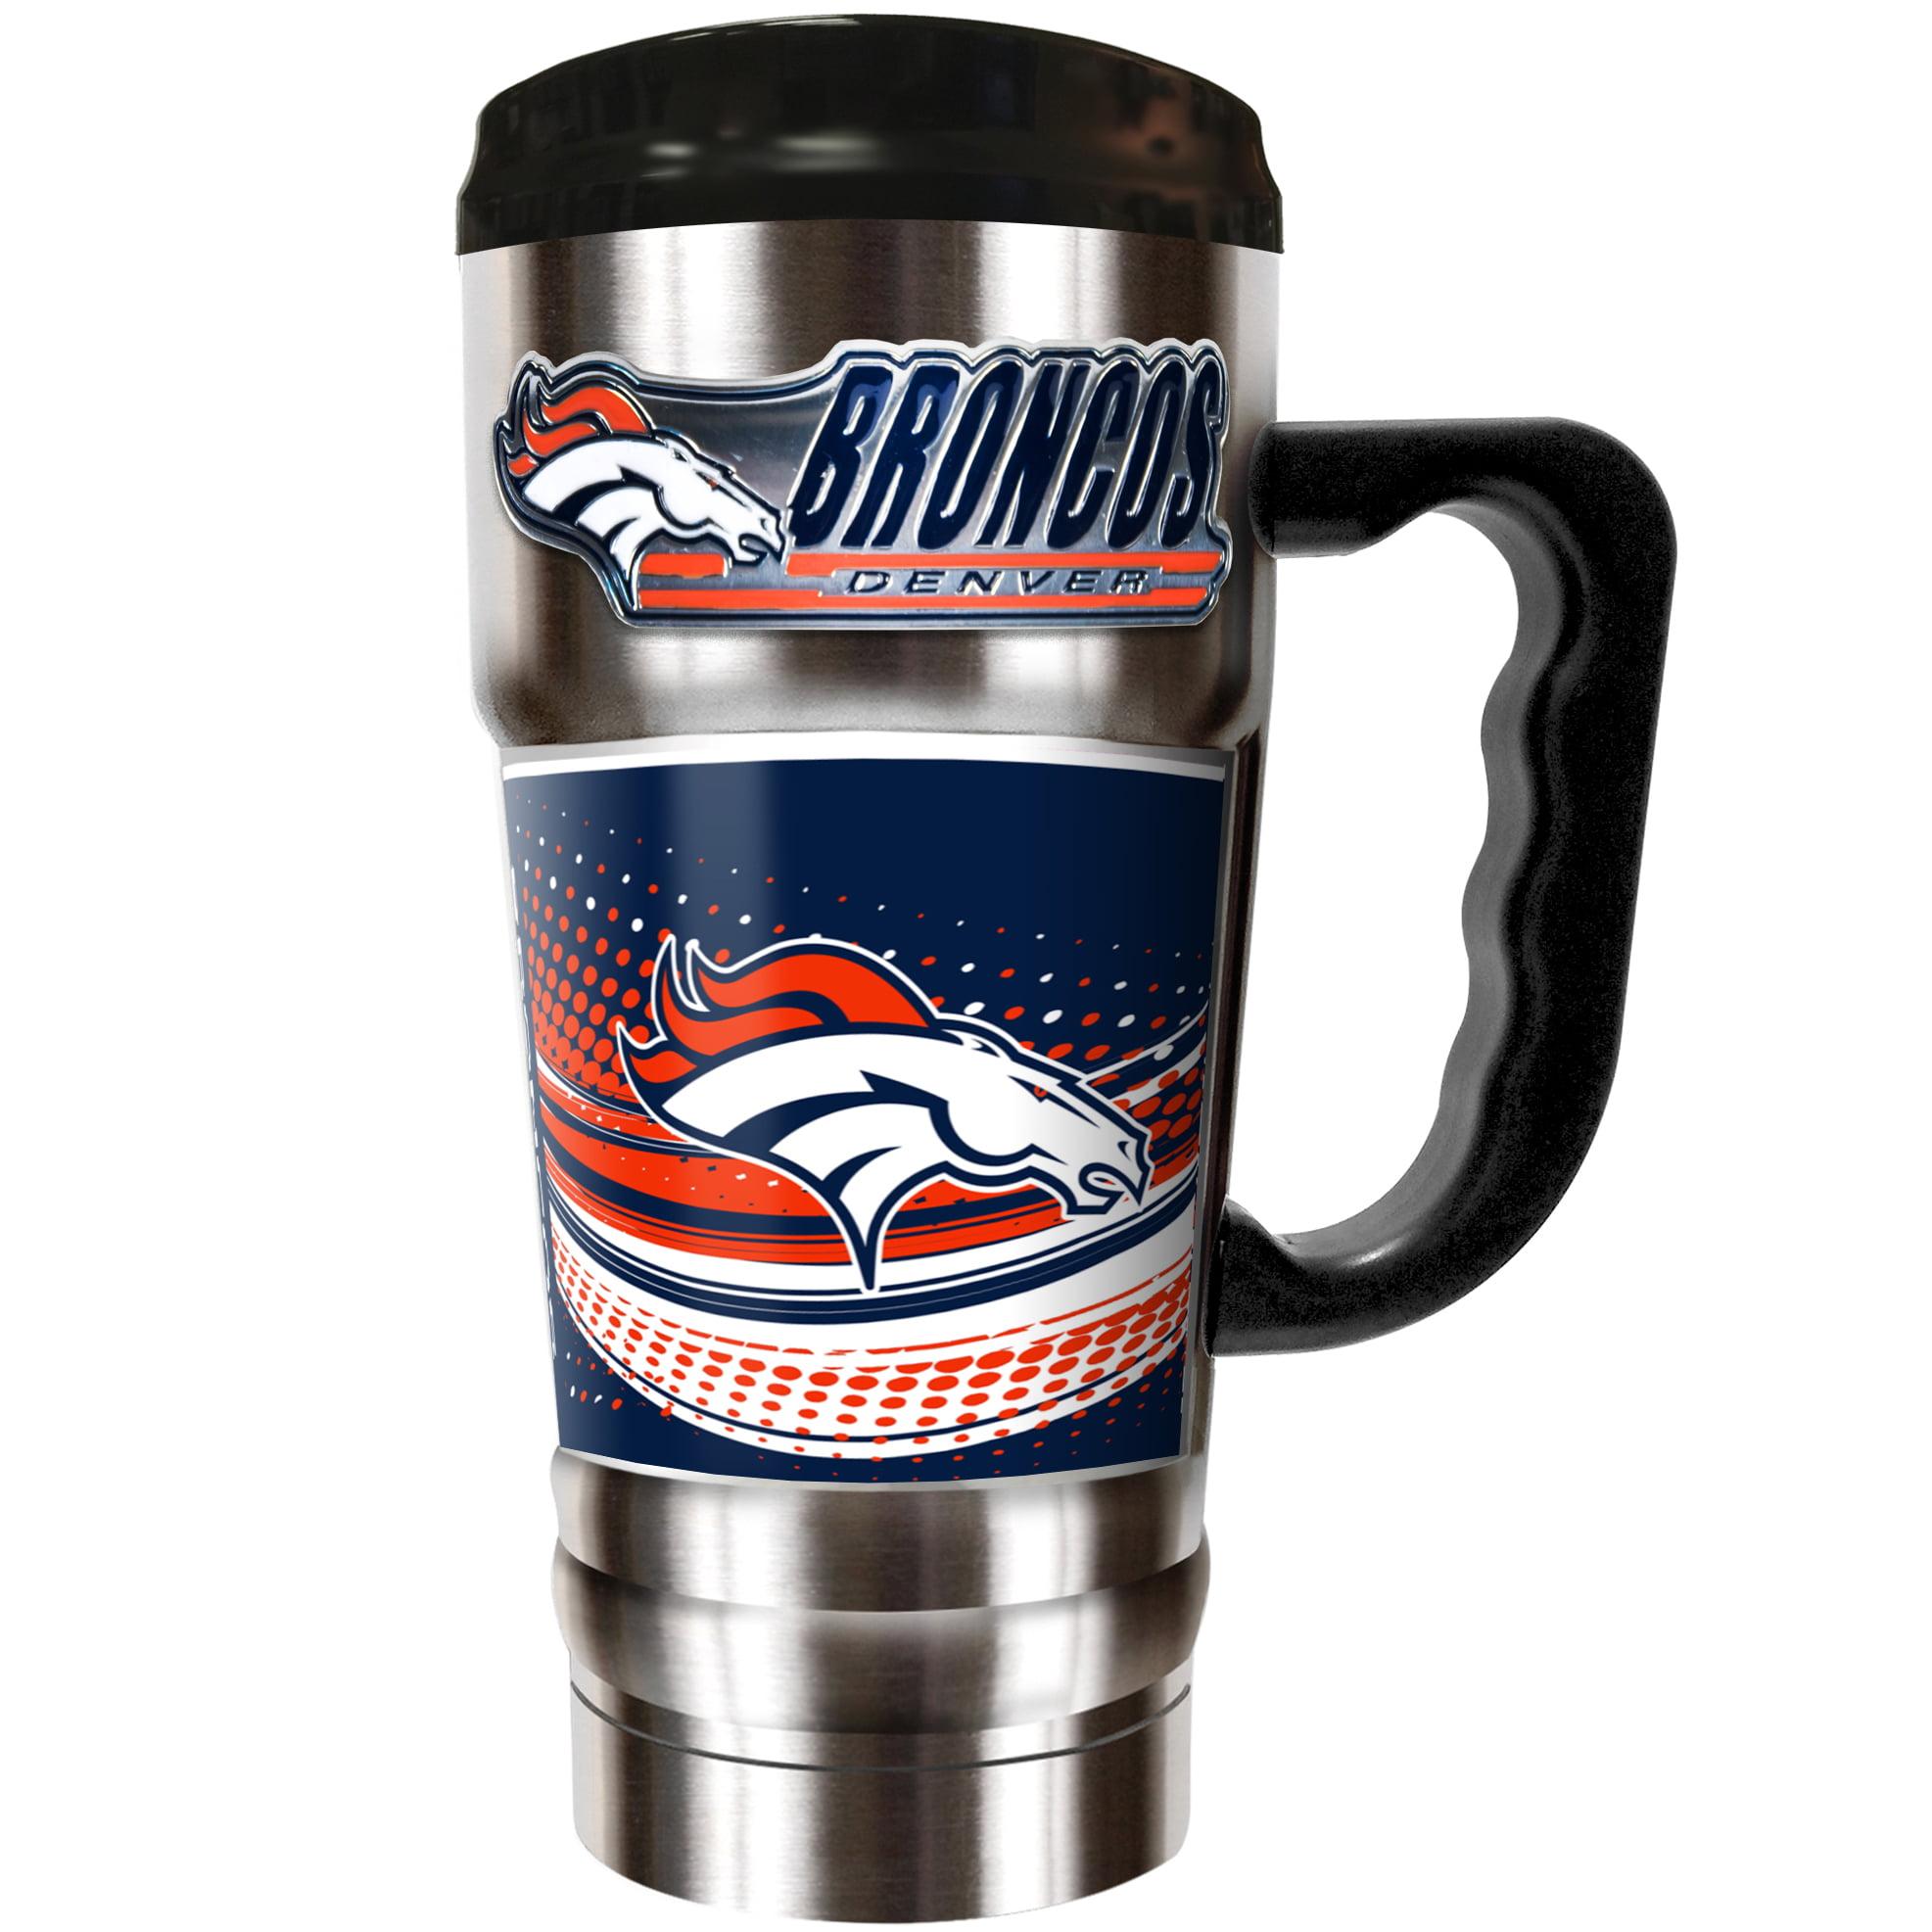 Denver Broncos The Champ 20 oz. Travel Tumbler - Silver - No Size